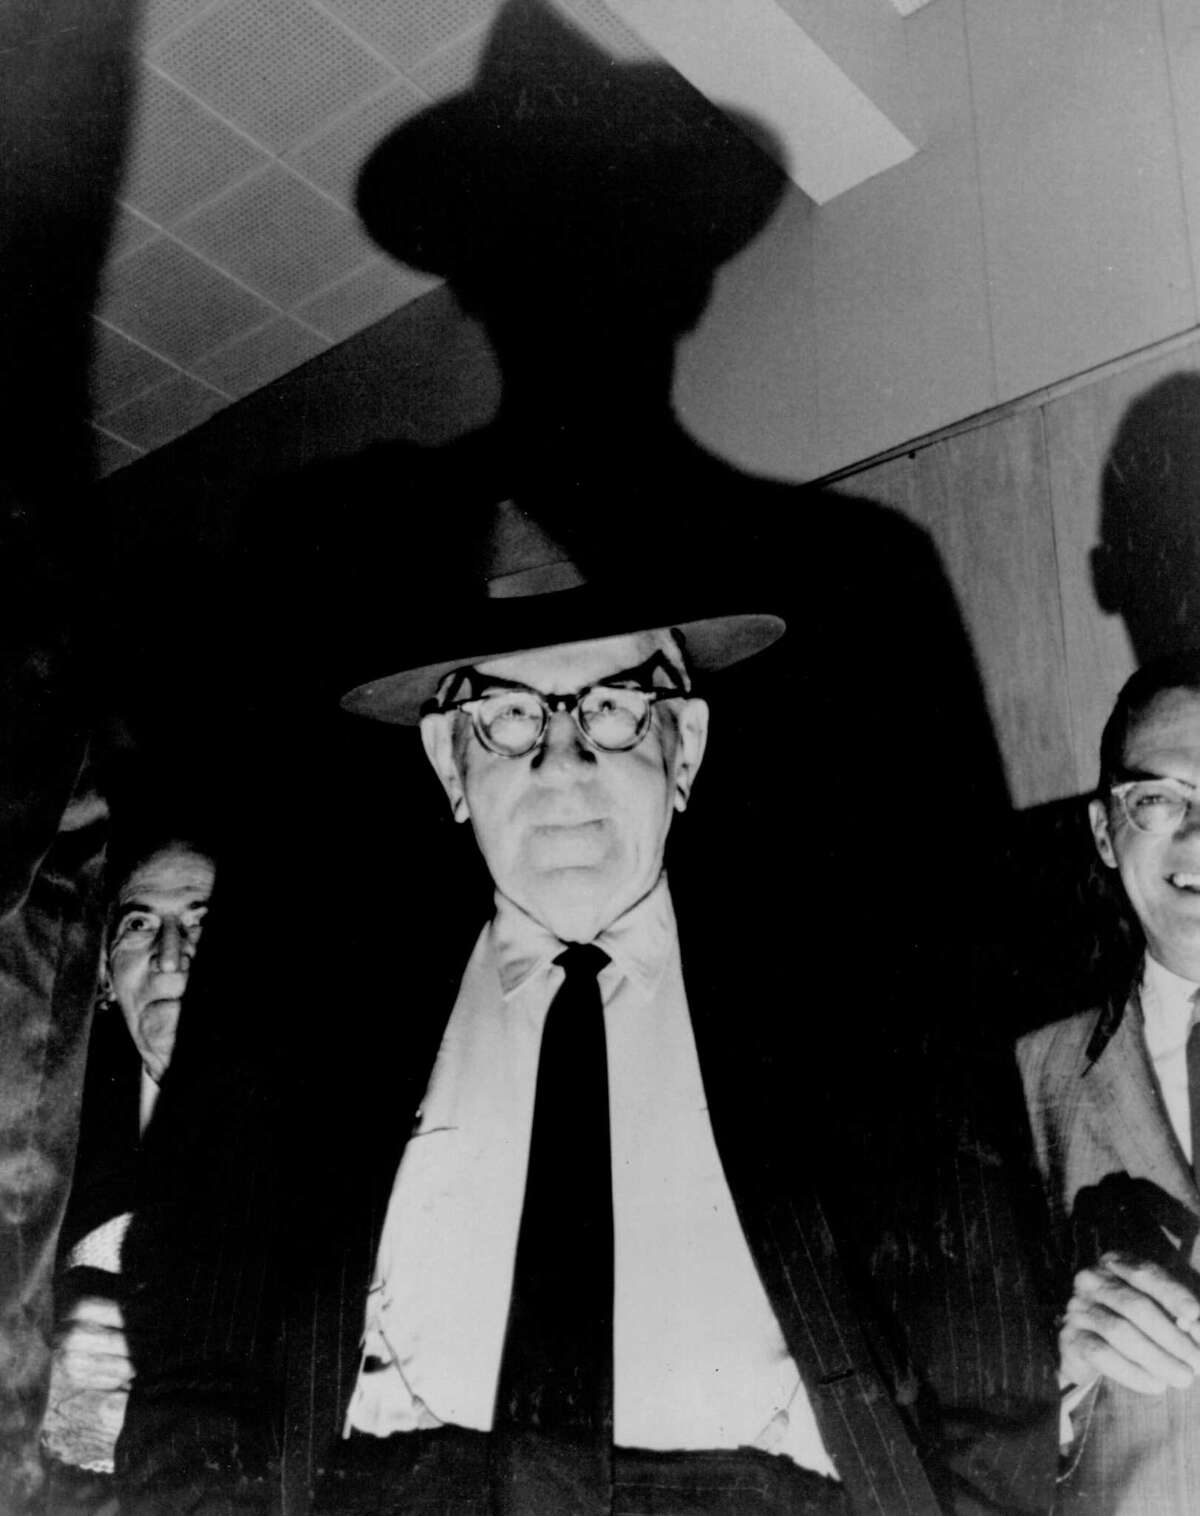 Albany County Democratic boss Dan O'Connell, undated. (Bernie Kolenberg, Times Union archives/Courtesy William Kennedy)